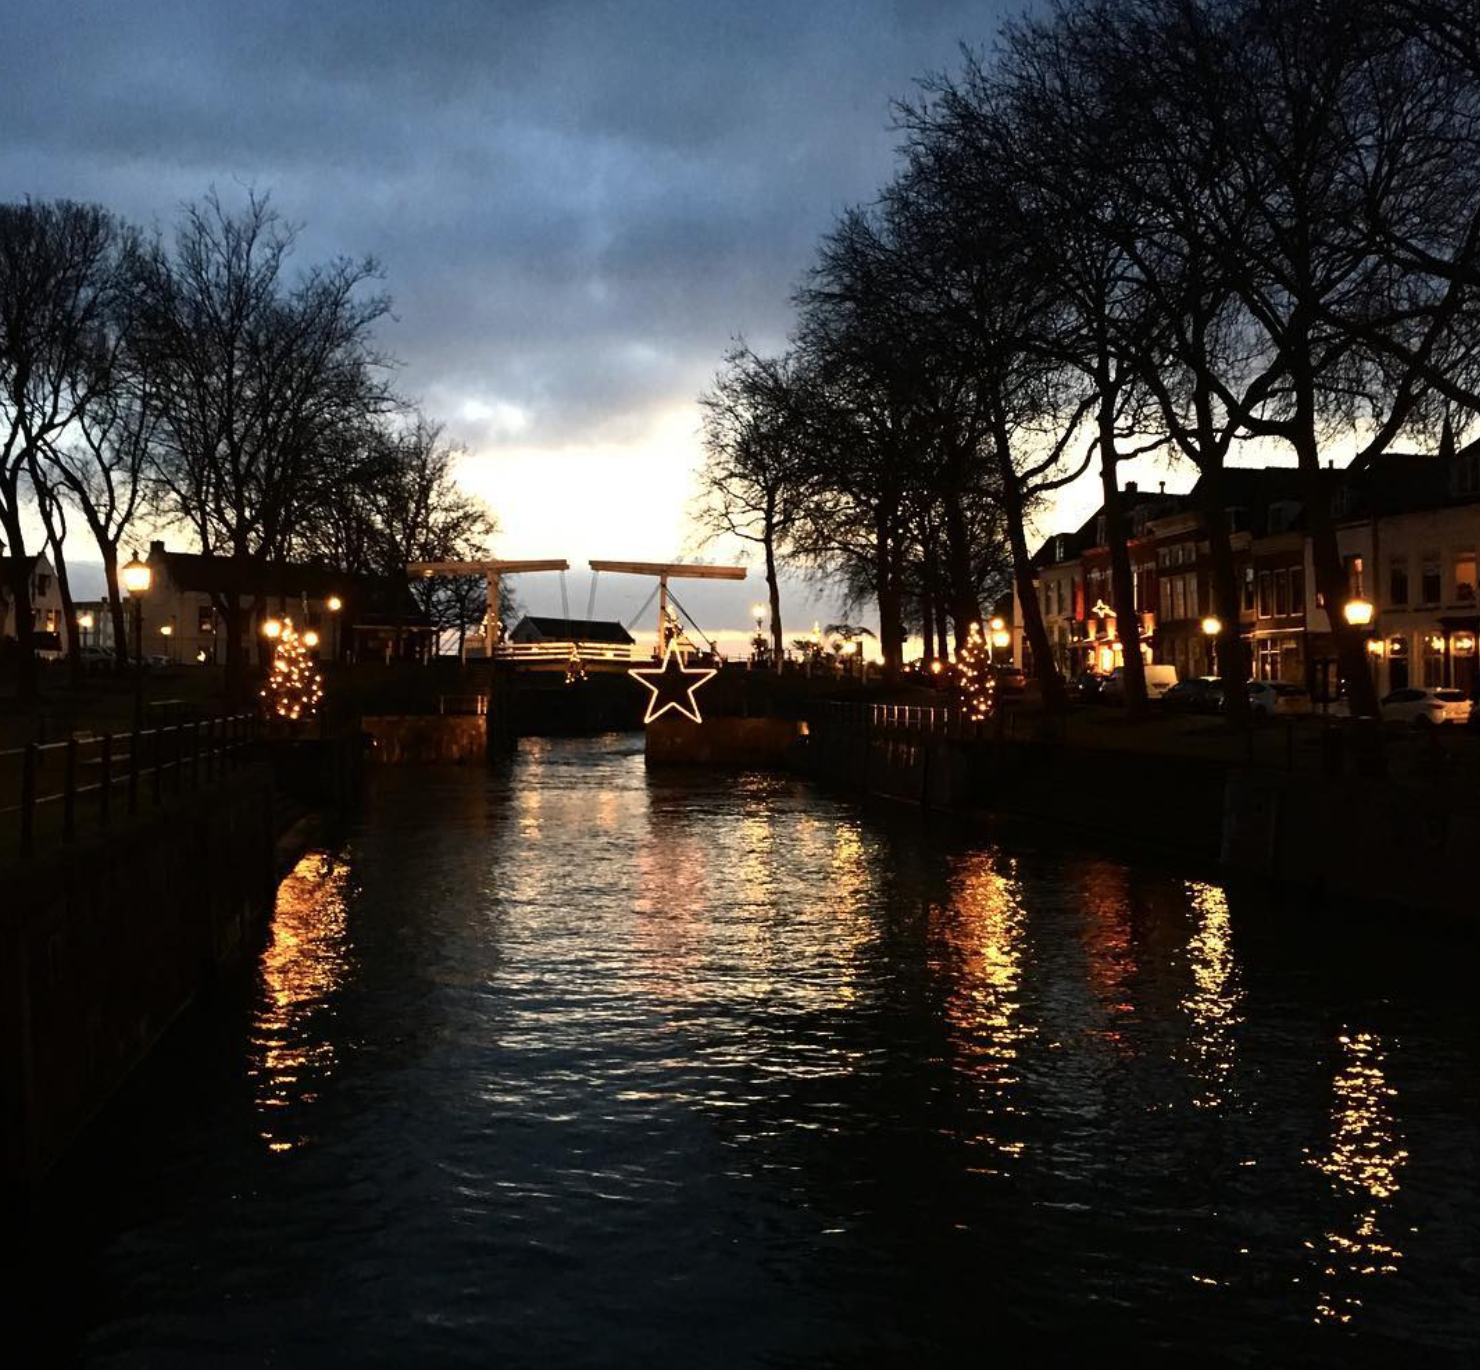 Winterse verlichting in Vreeswijk